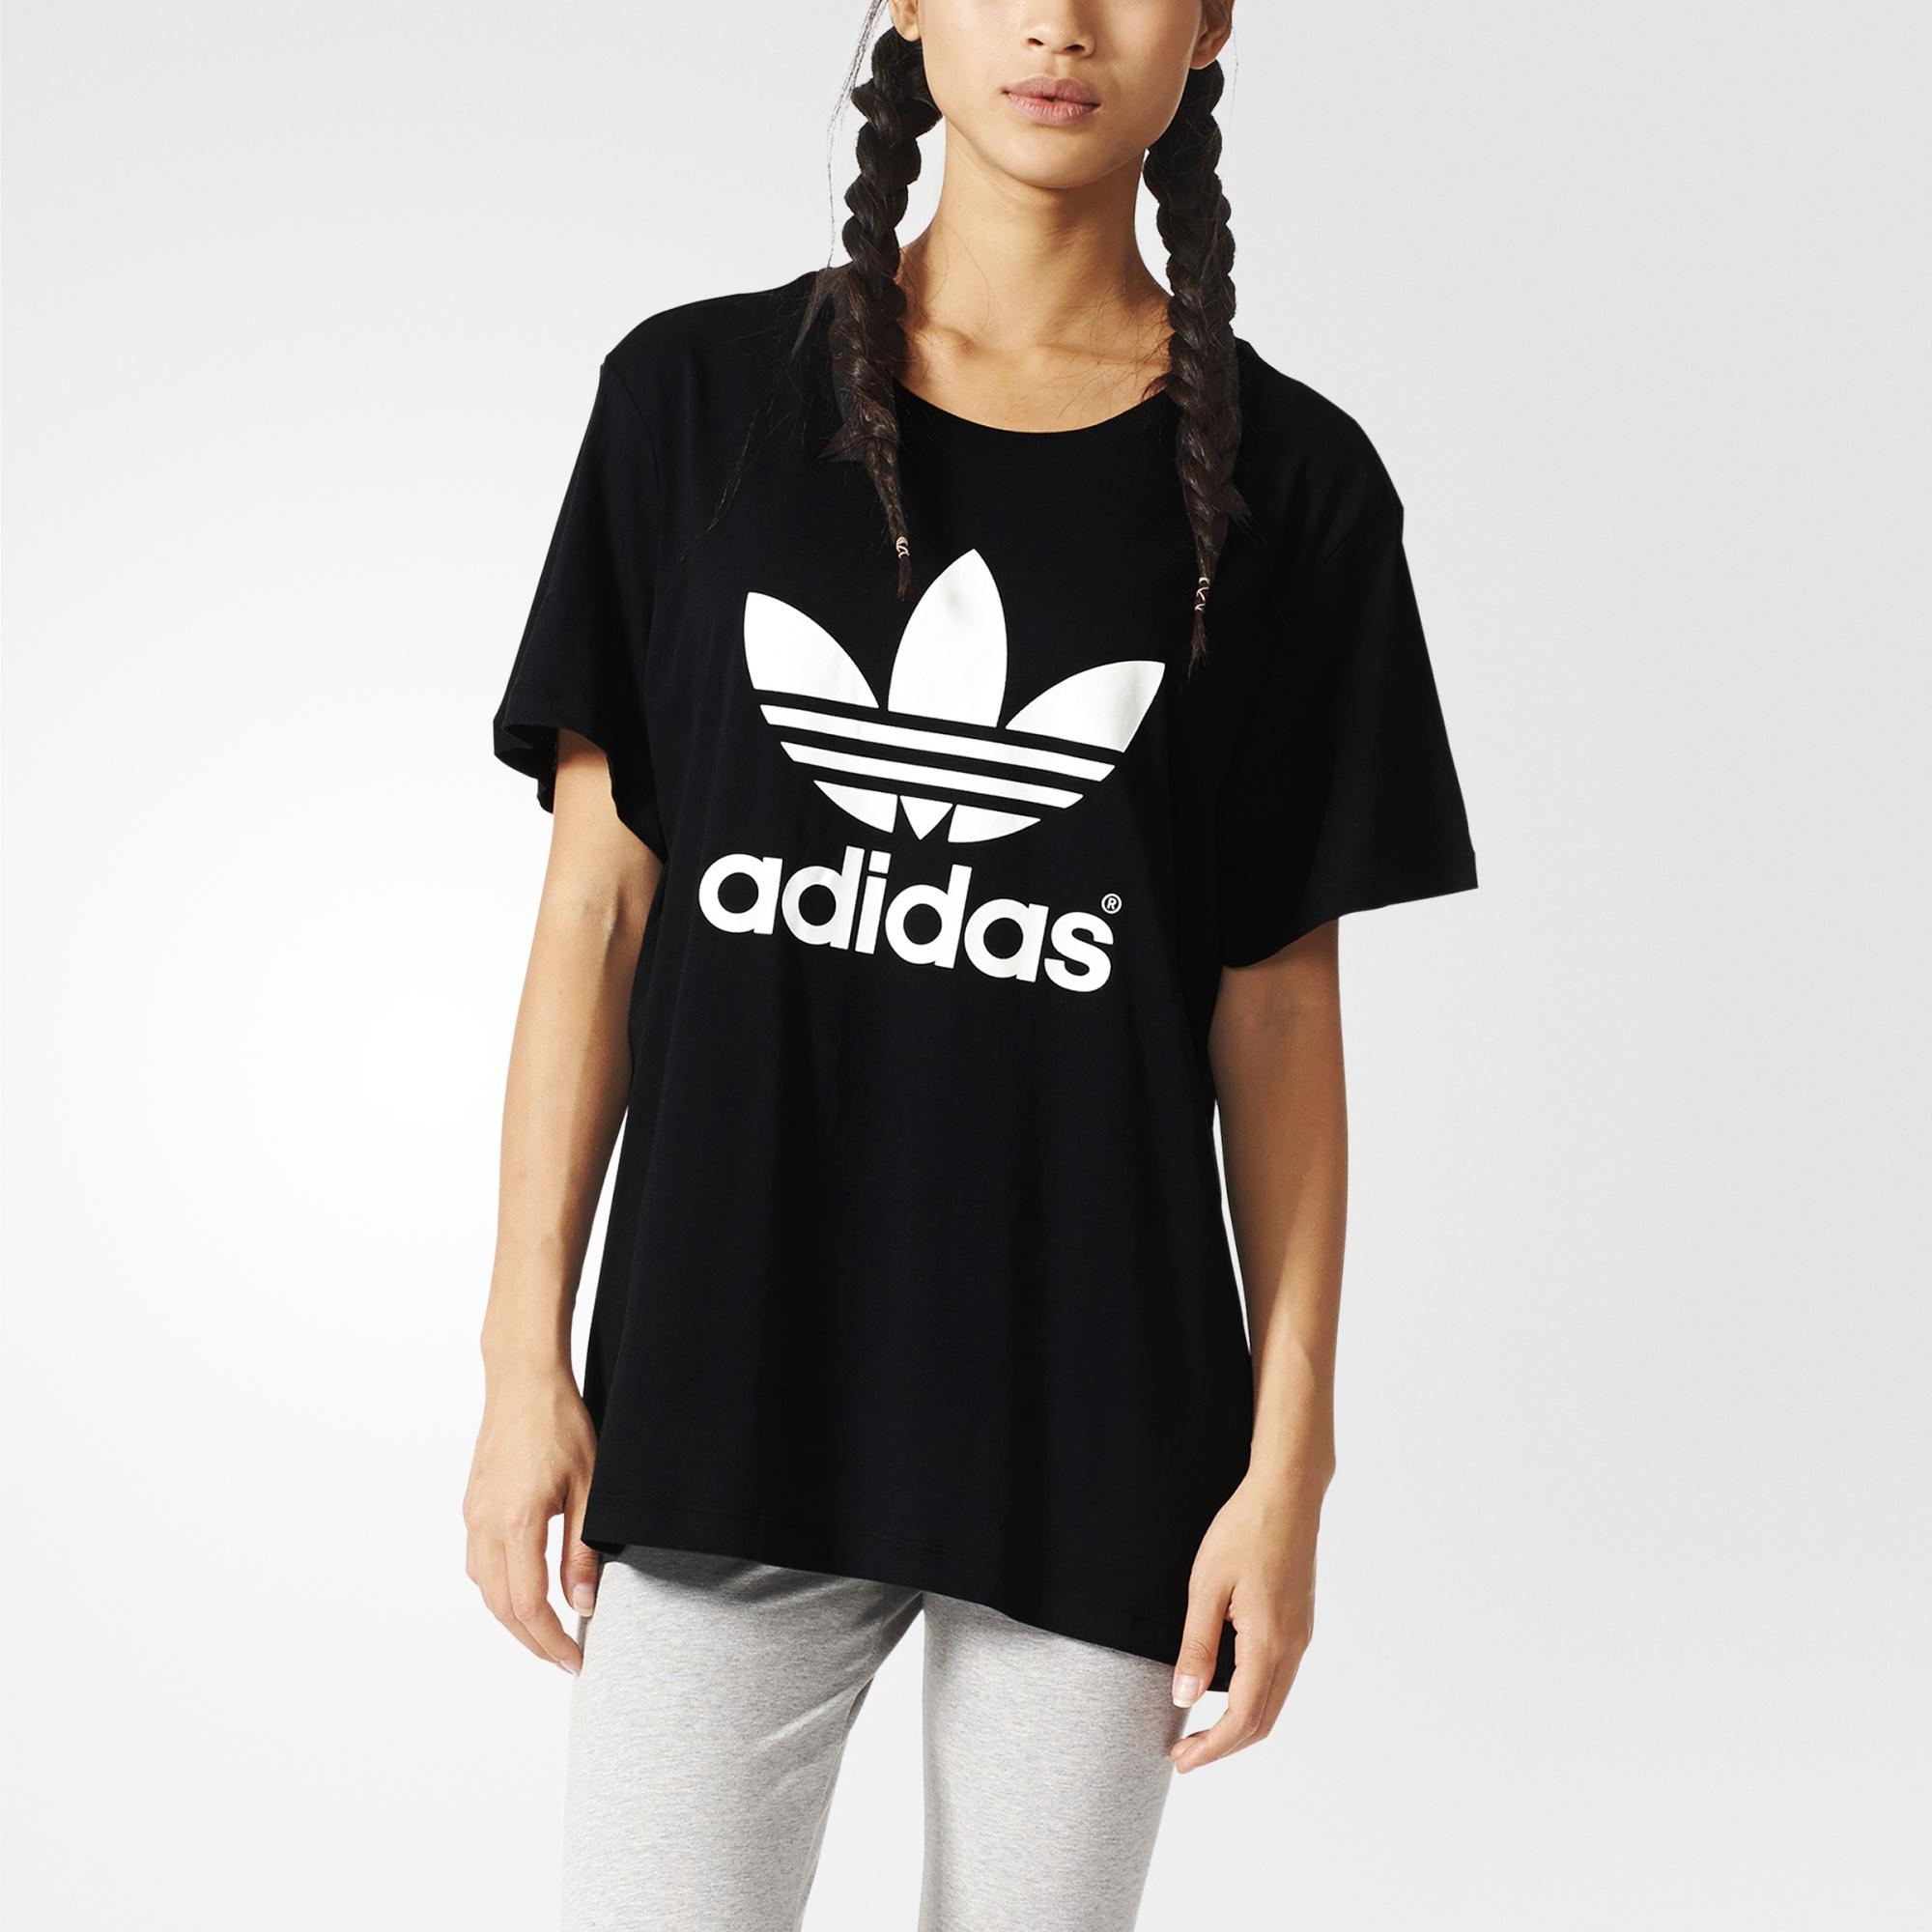 Adidas Shirt adidas boyfriend trefoil tee - black | adidas uk ABGYMOG